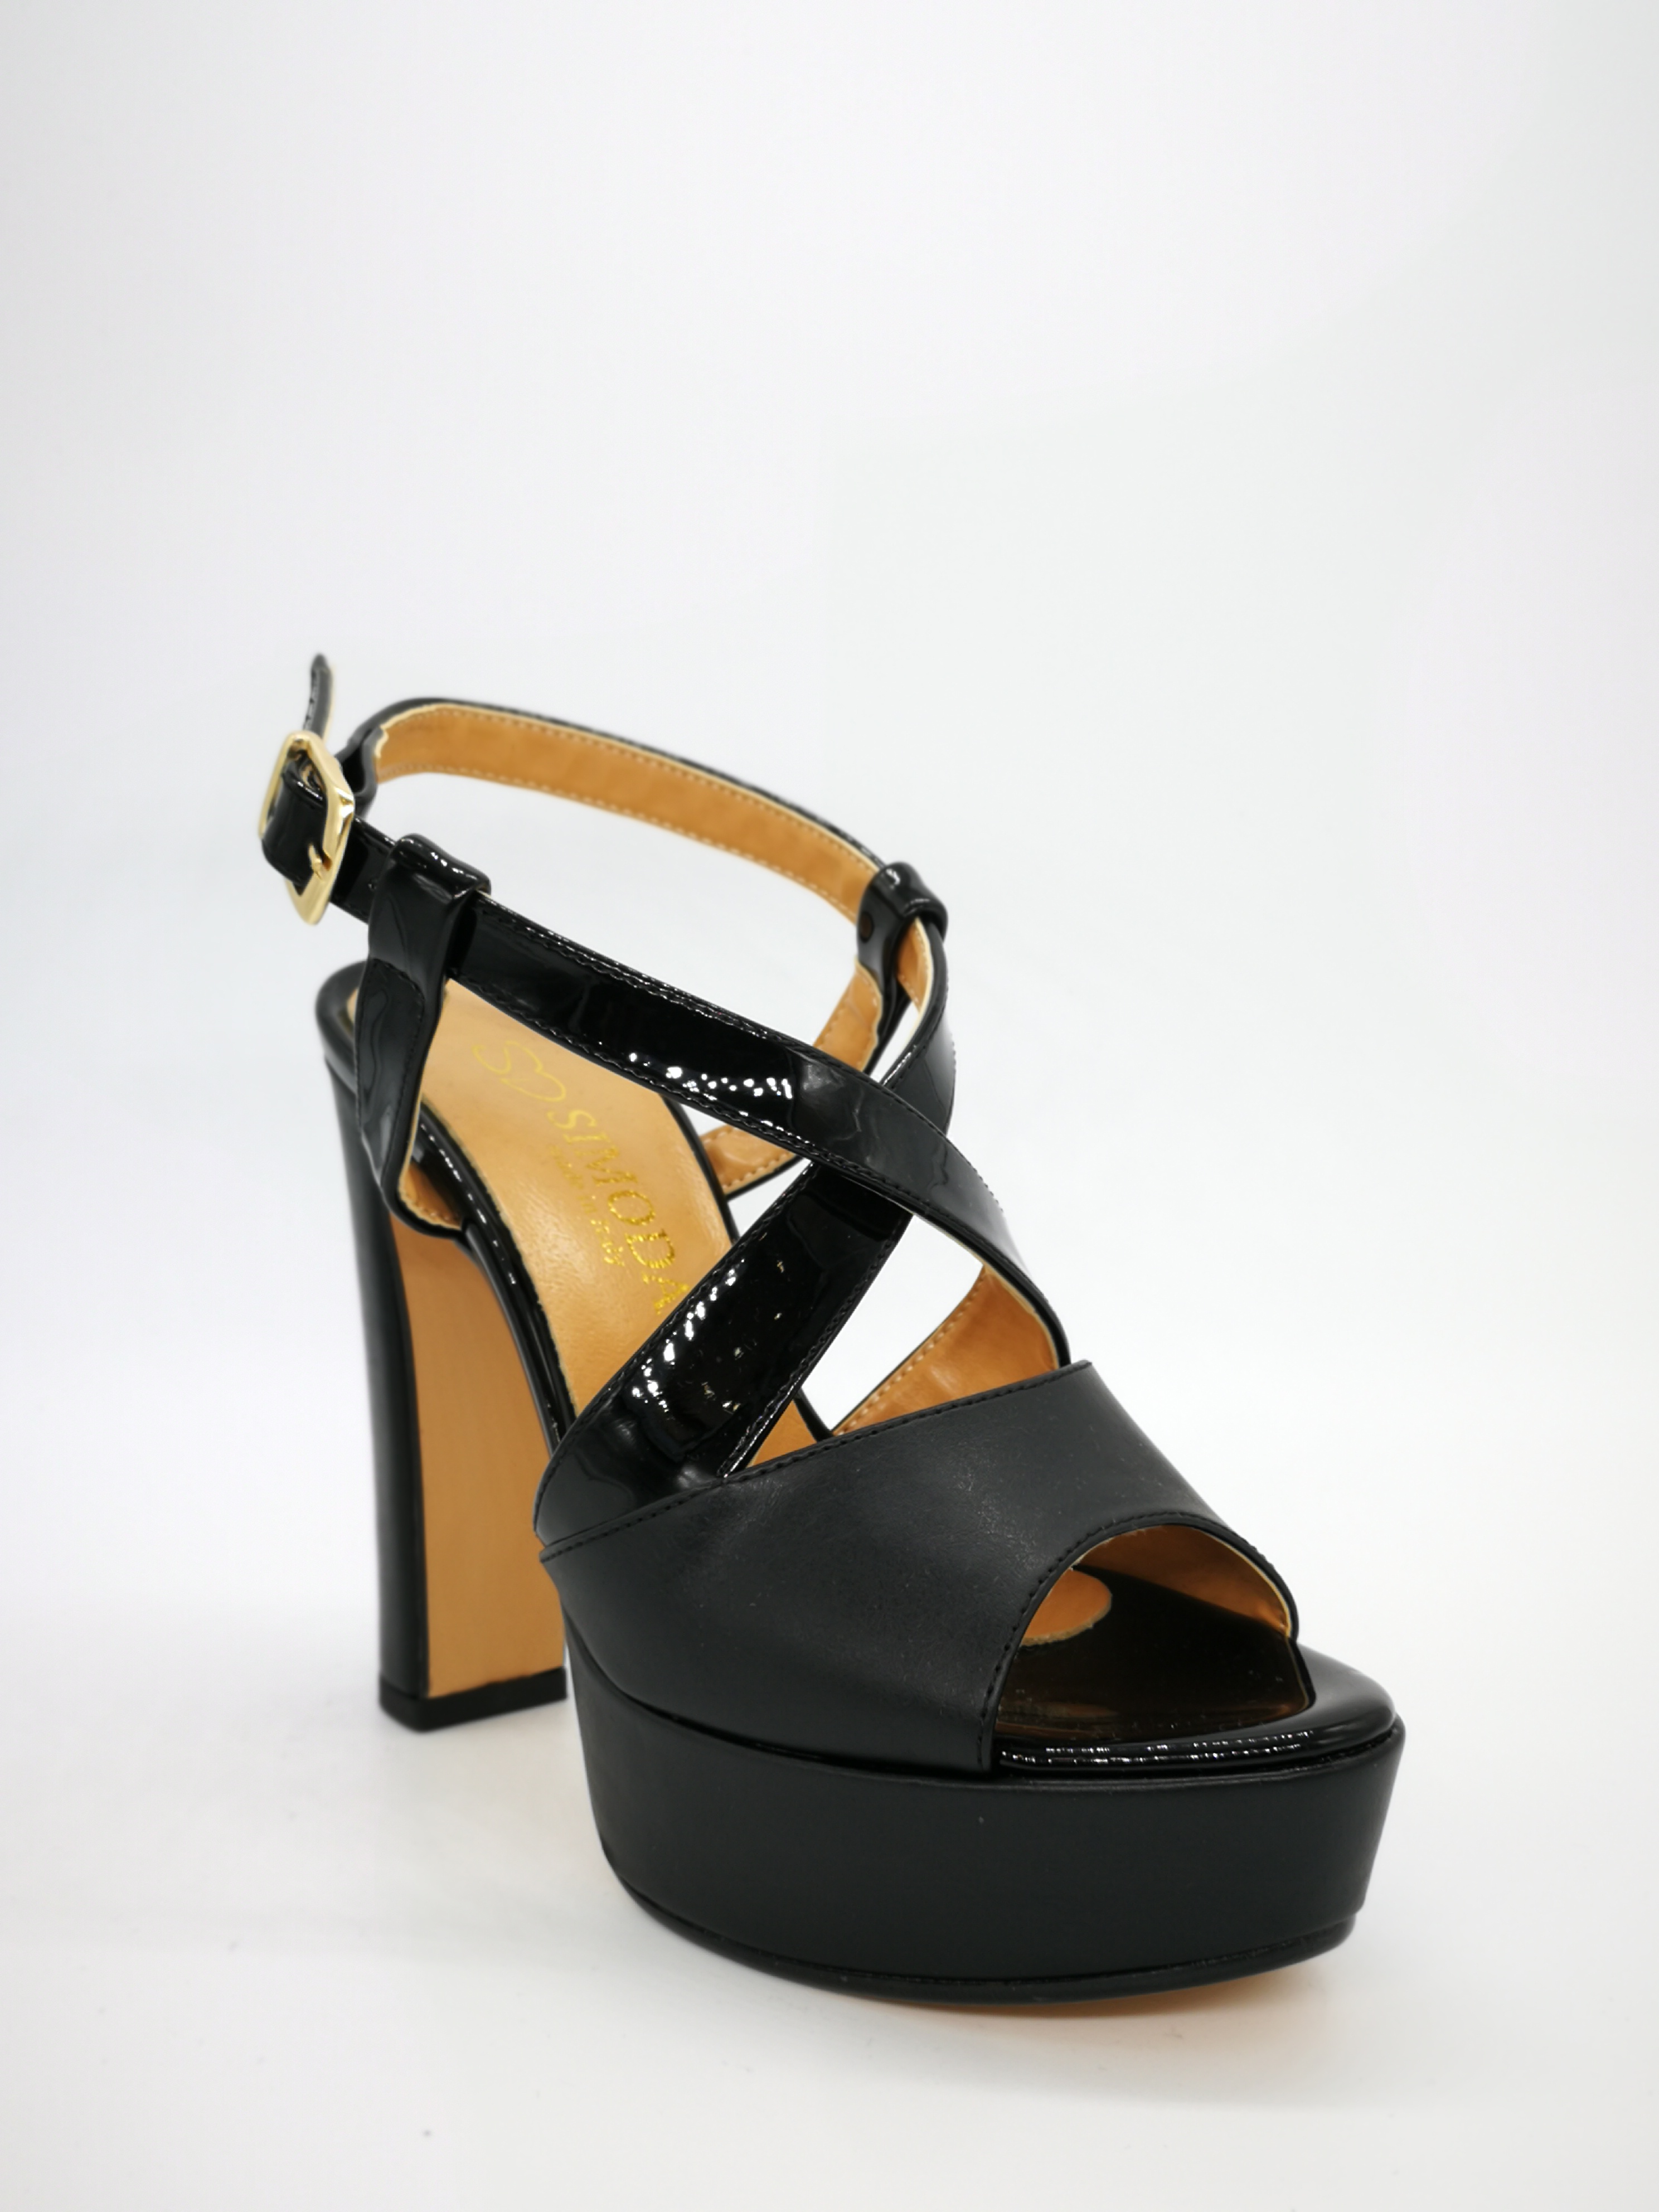 negro 12 de de tacón de altas Plateau Mujer Sandalias cm cuero Art240ne 3 Zapatos zpMVSU